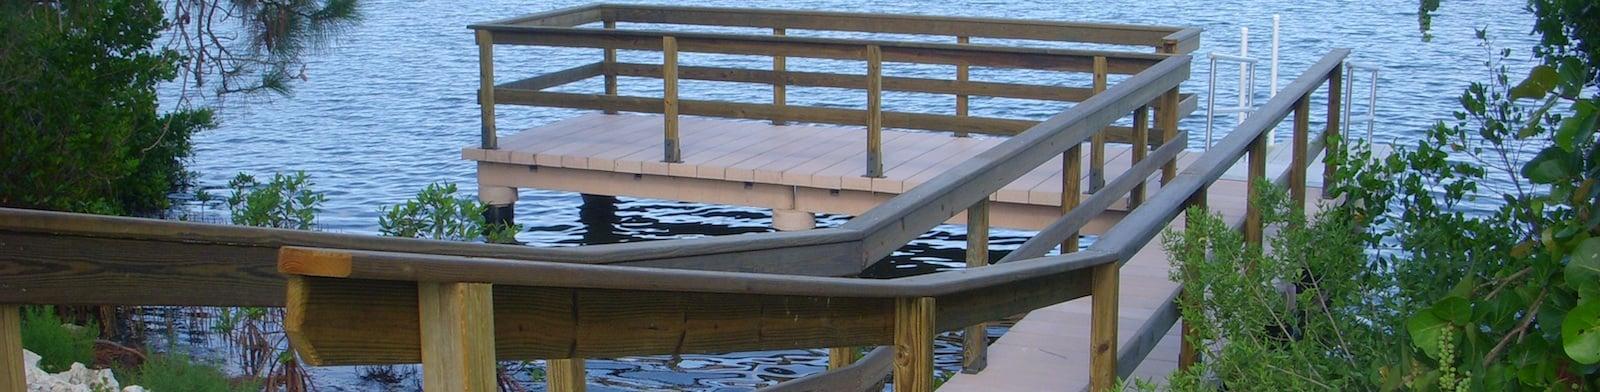 Osprey_HV_Observation_Deck_Coastal_Construction.jpeg